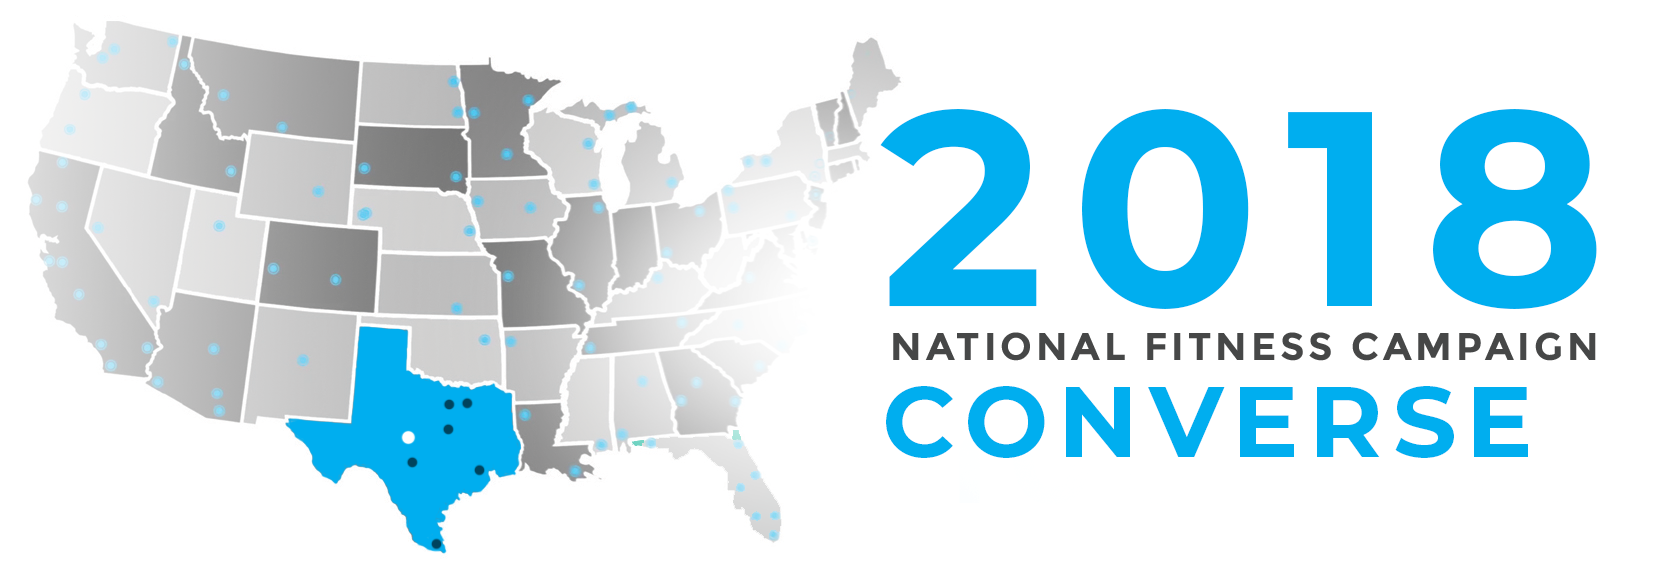 2018 Campaign Logo Converse.png